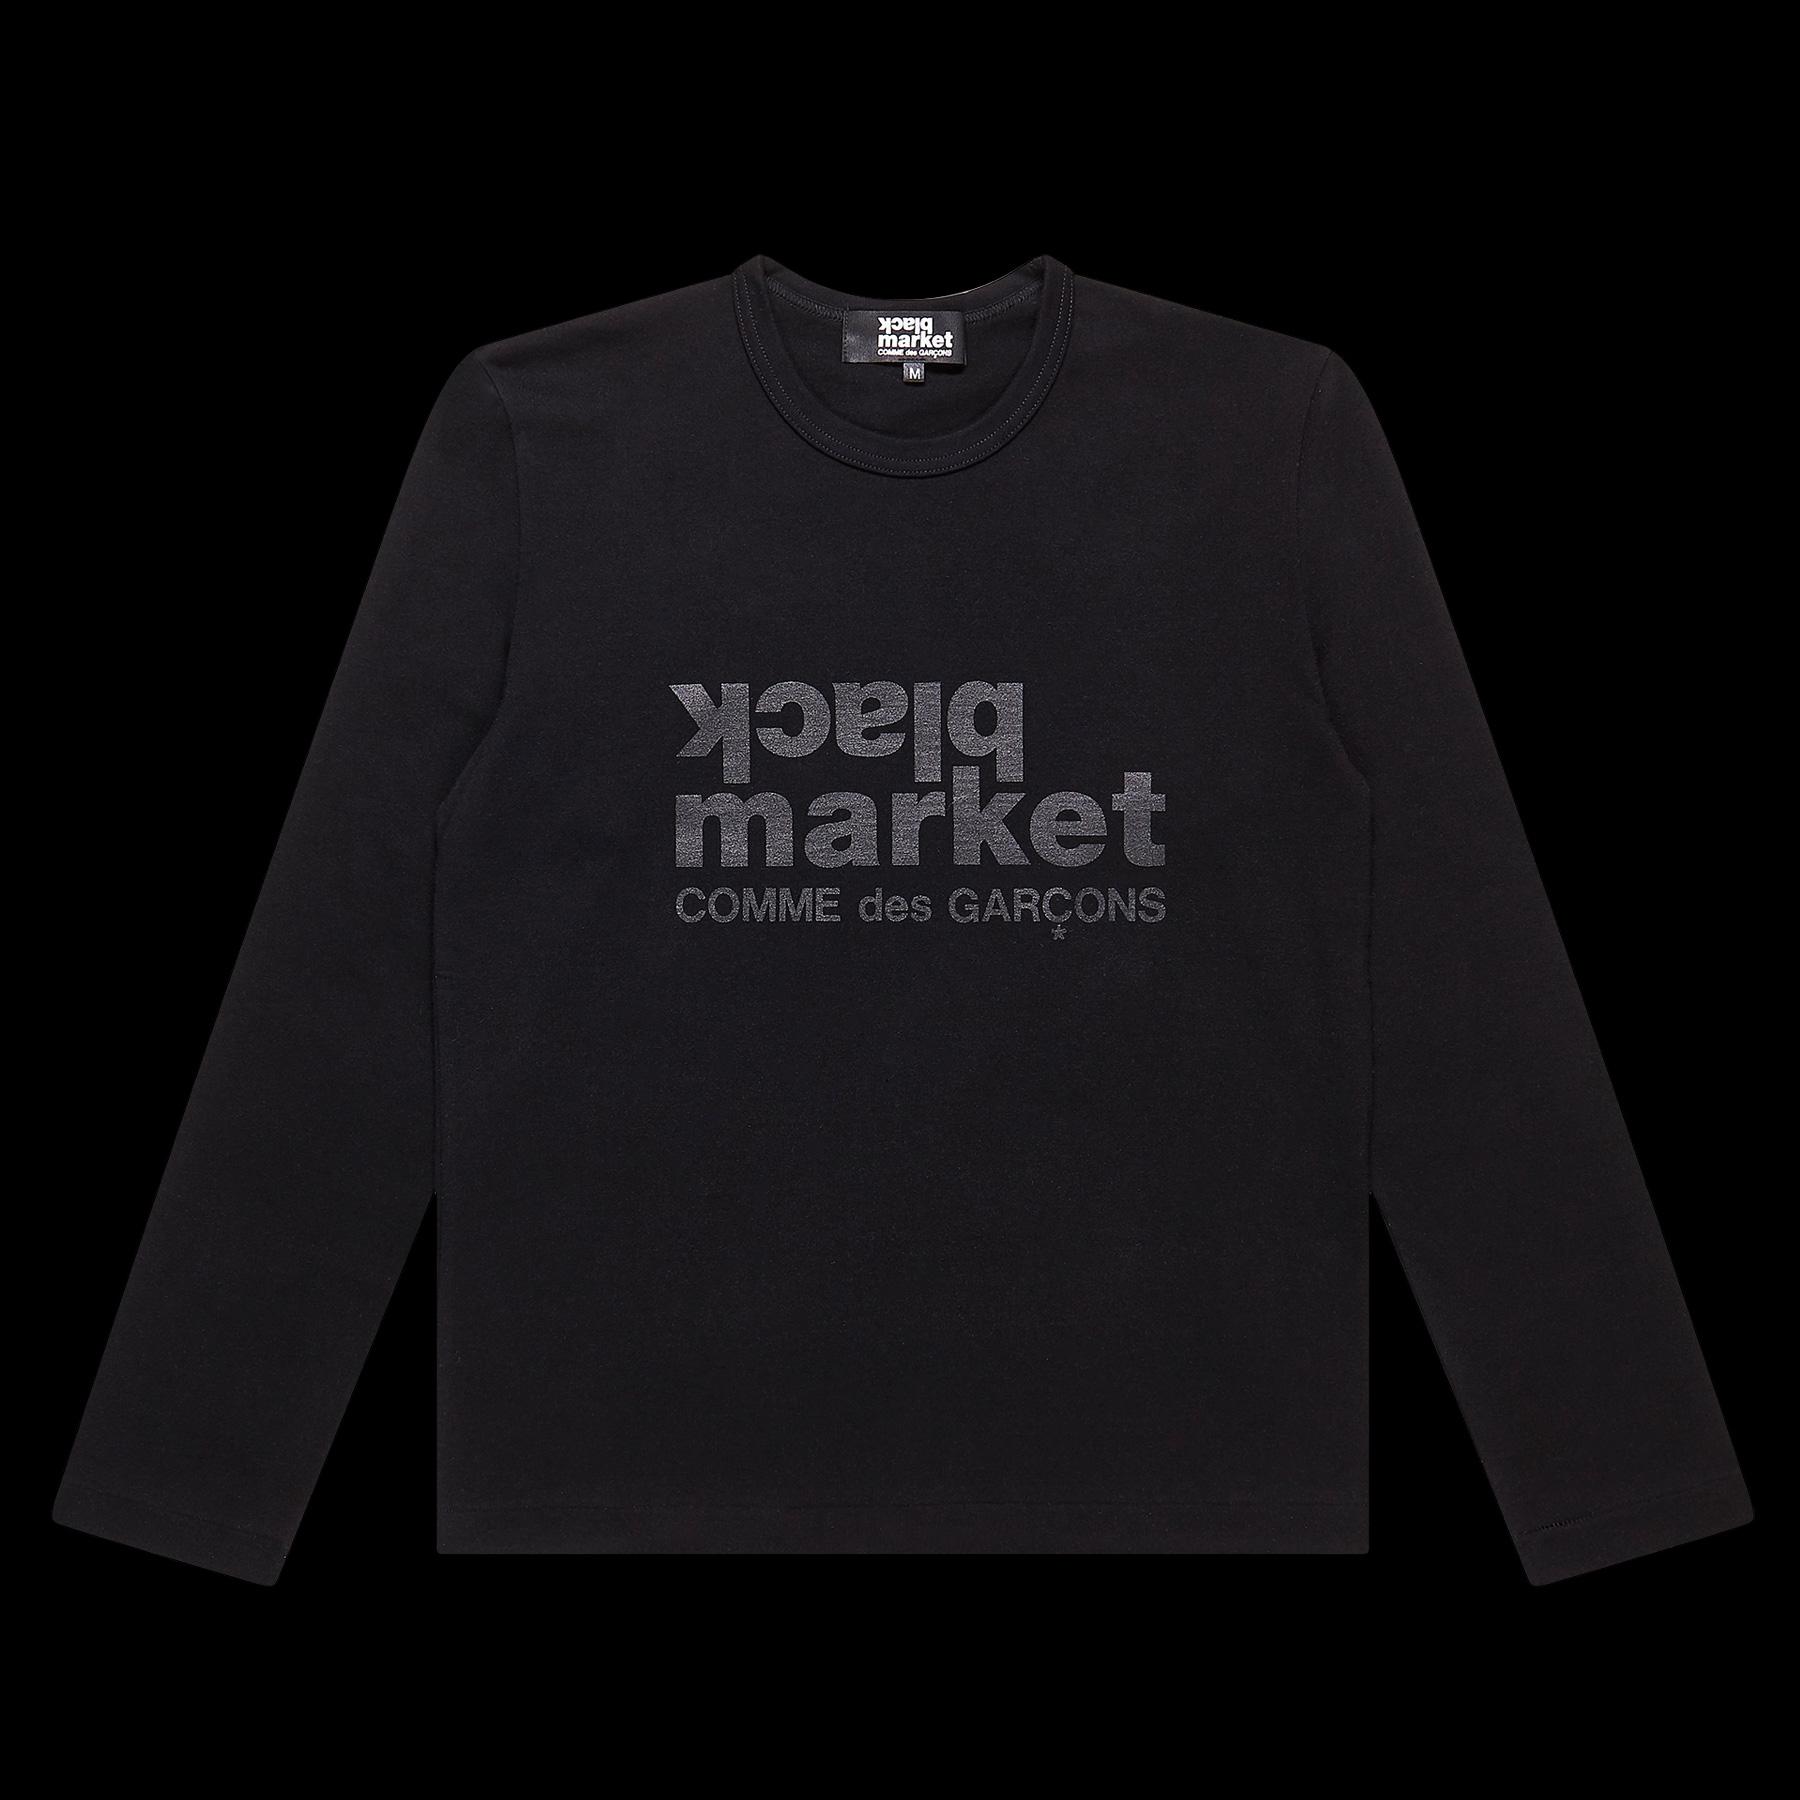 Black_Market_CDG_Event_T-Shirt_OD-T001-051_BLACK _F.jpg